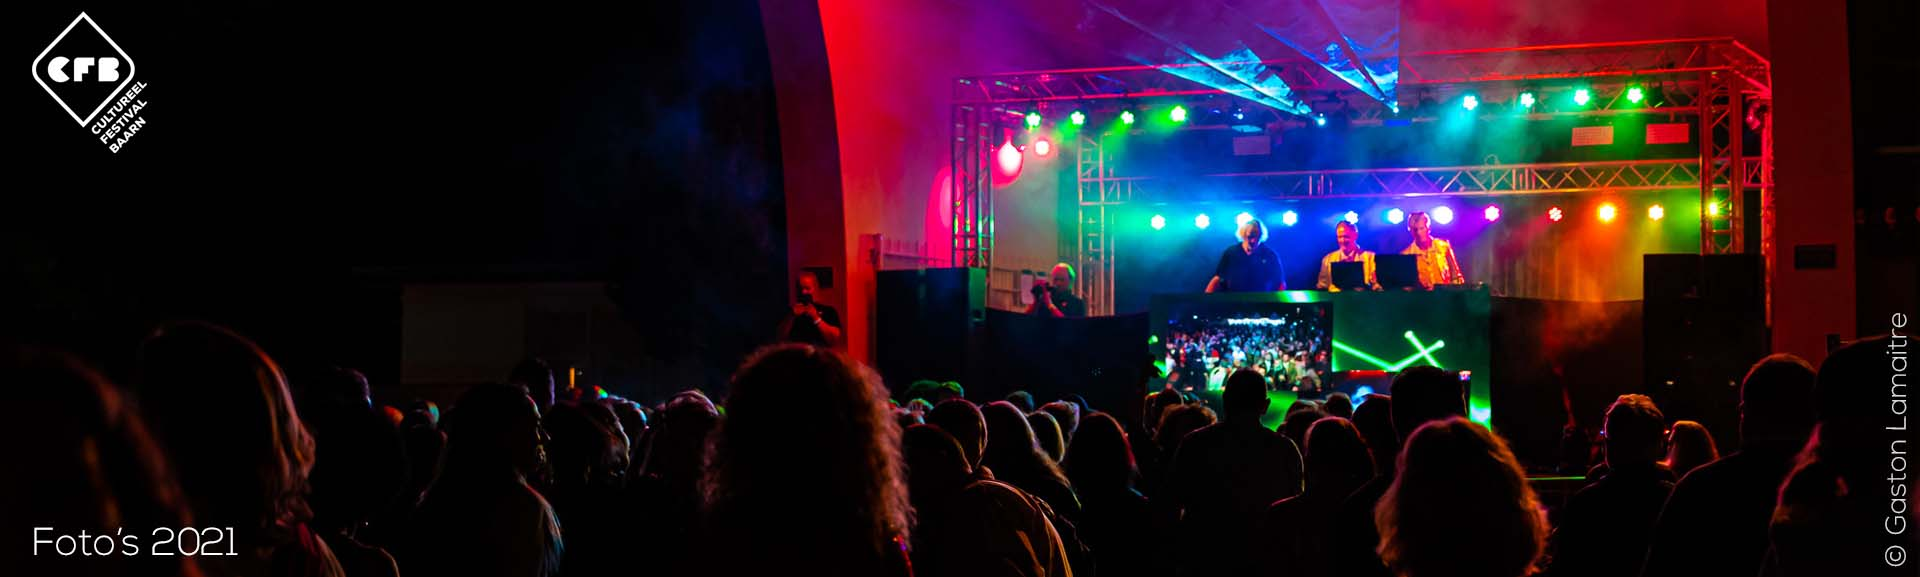 Header-Cultureel-Festival-Baarn-foto's